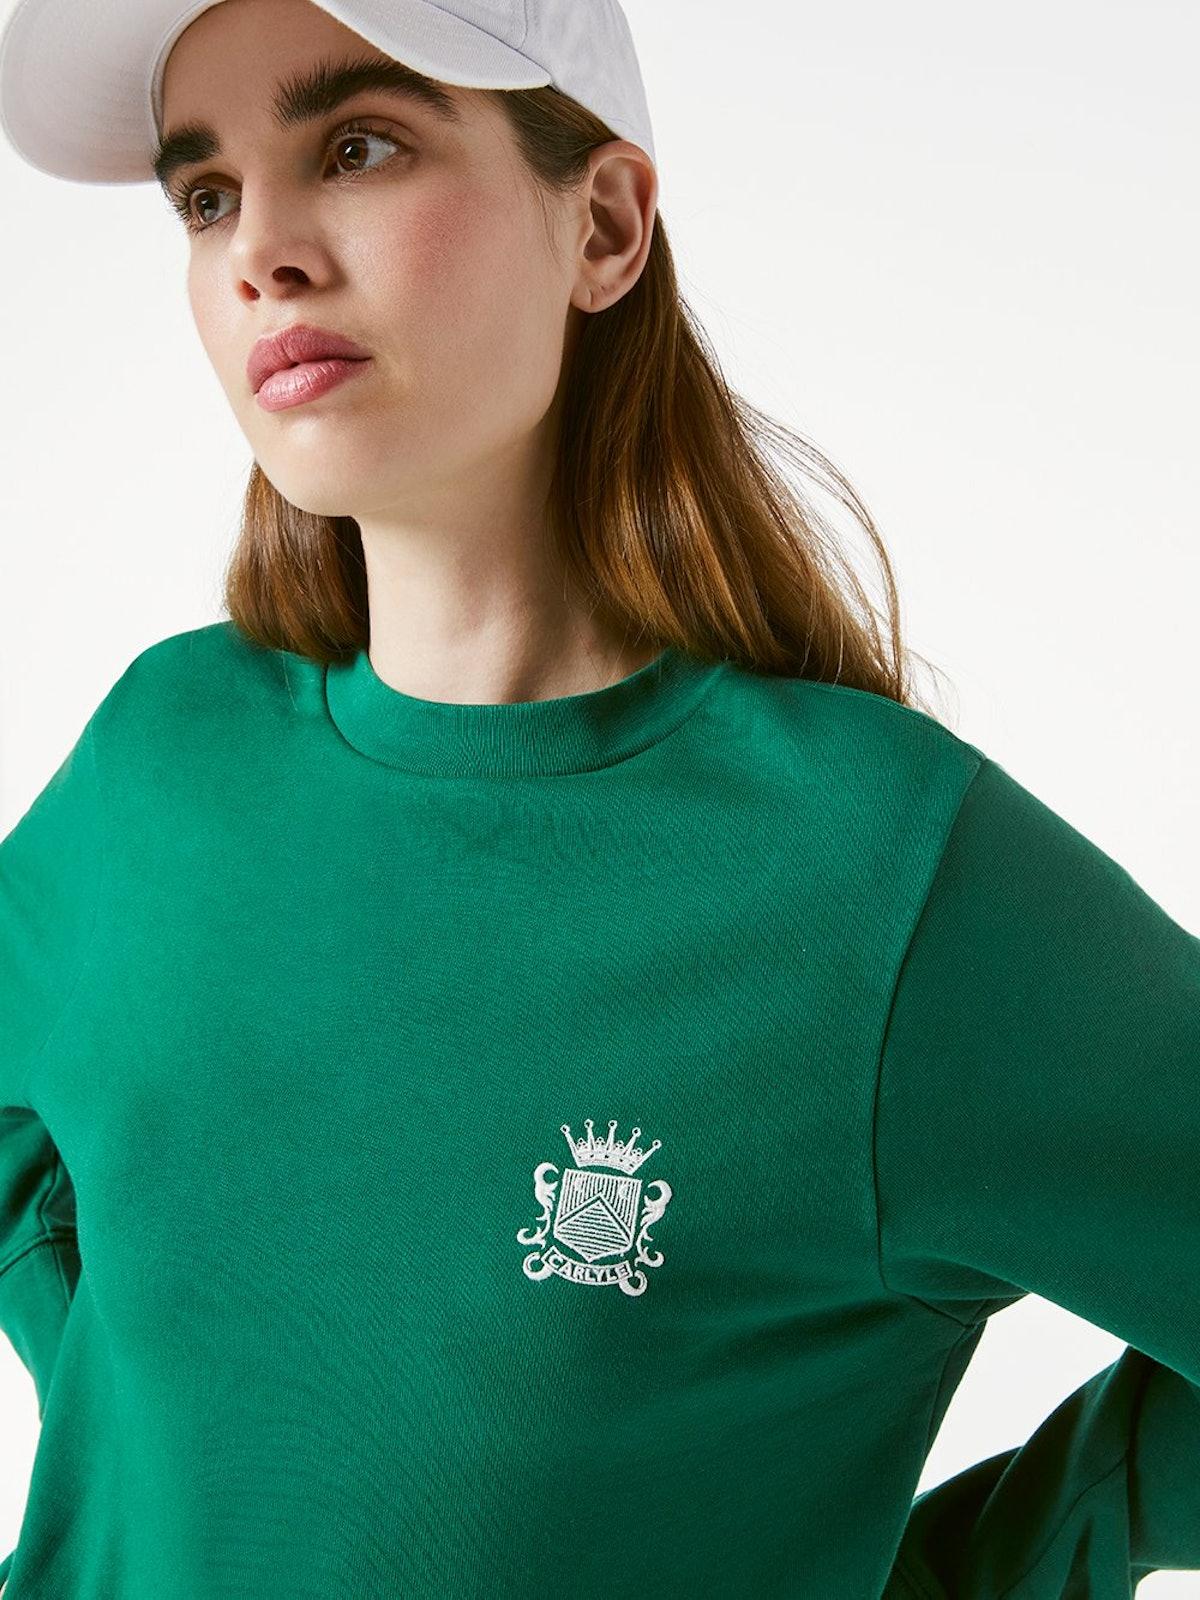 Carlyle Small Crest Sweatshirt